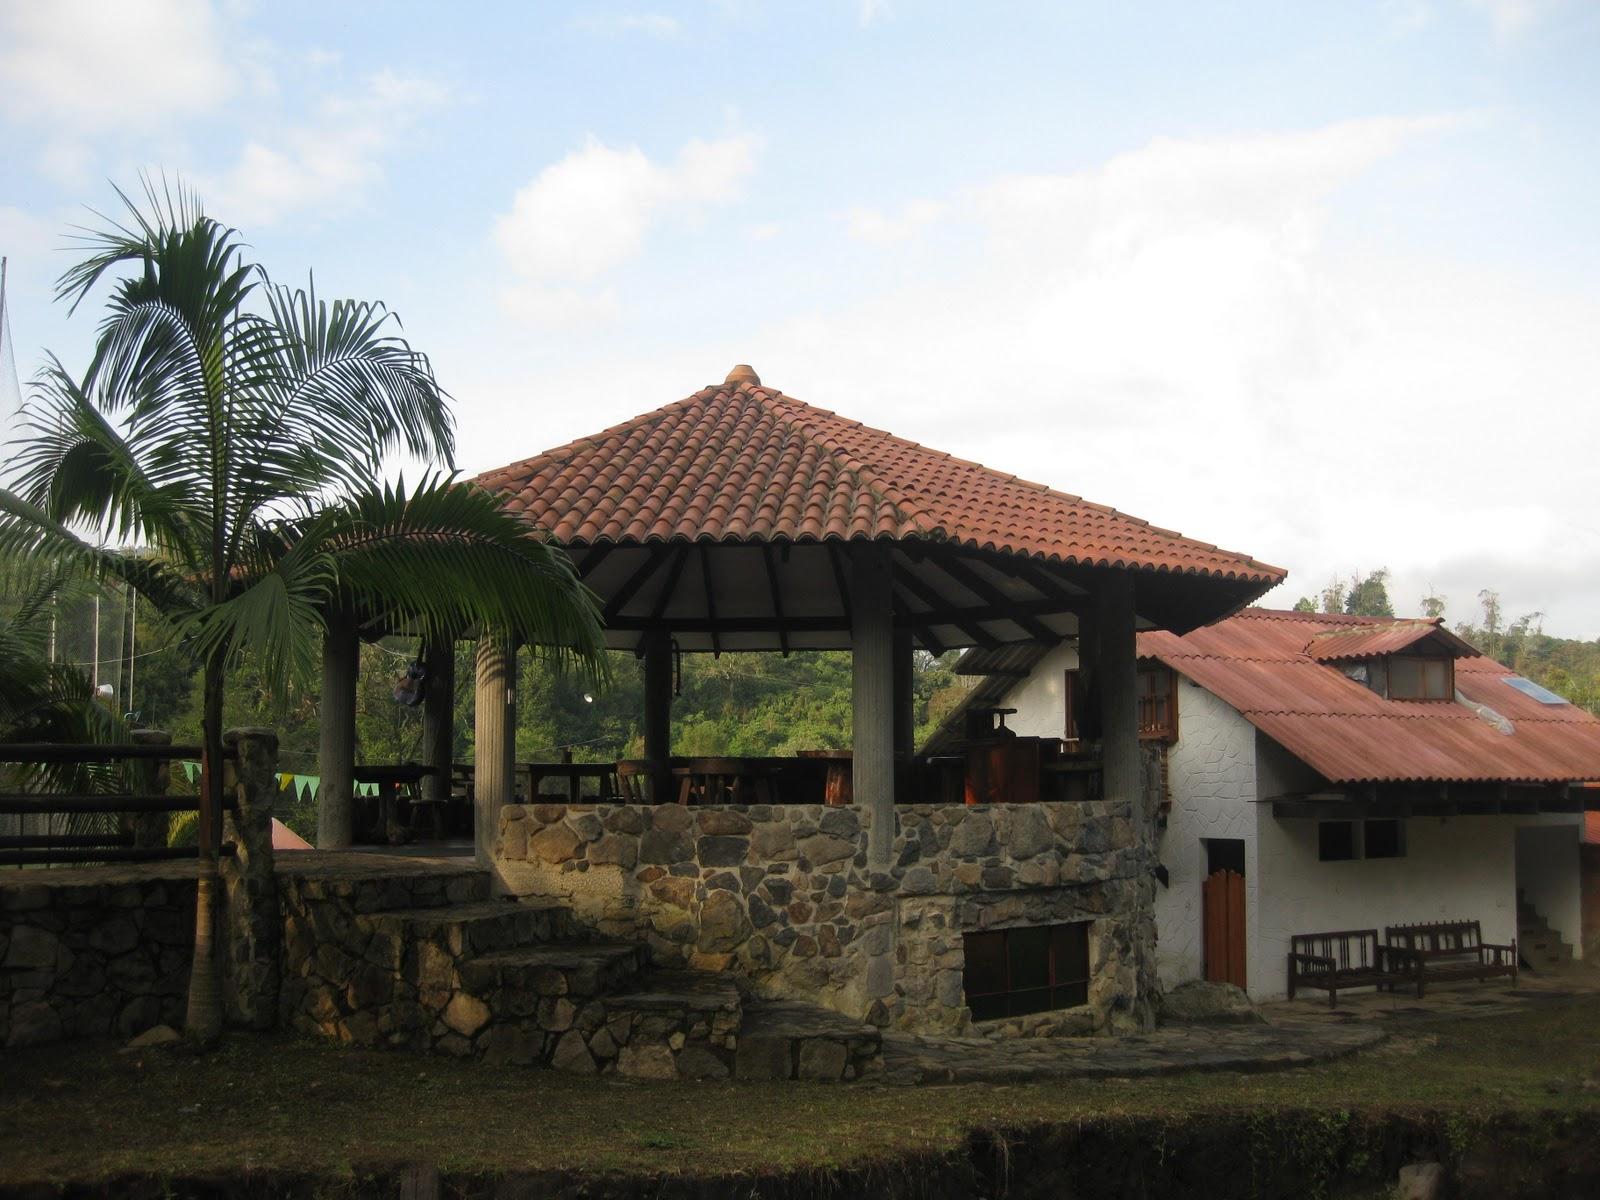 La casa del arbol san francisco cundinamarca colombia for La casa del azulejo san francisco